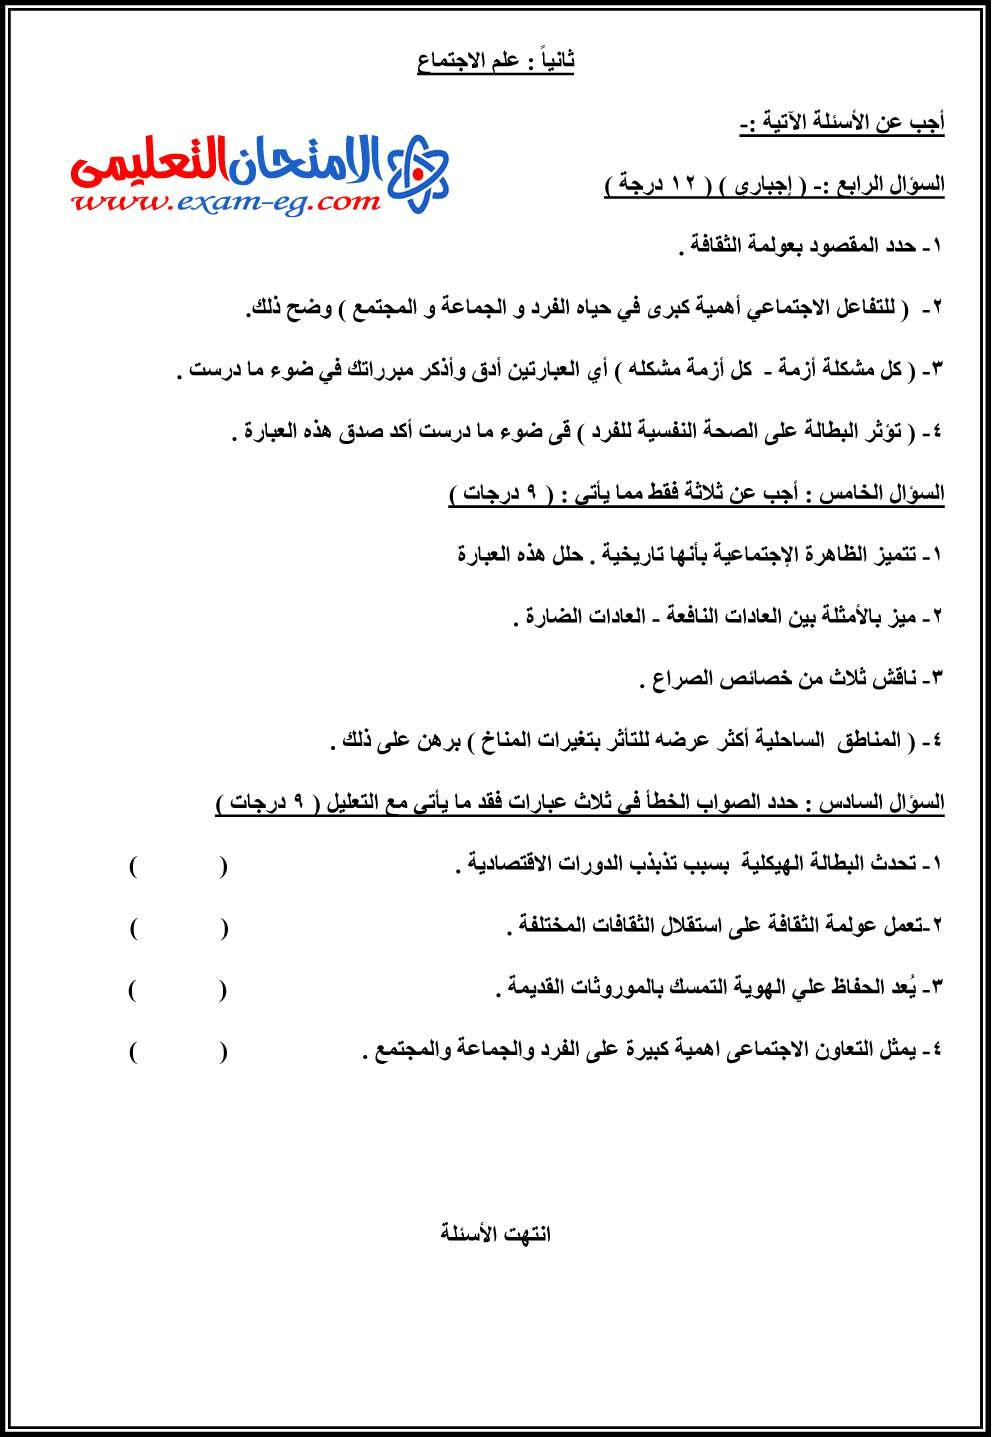 exam-eg.com_1396624146682.jpg